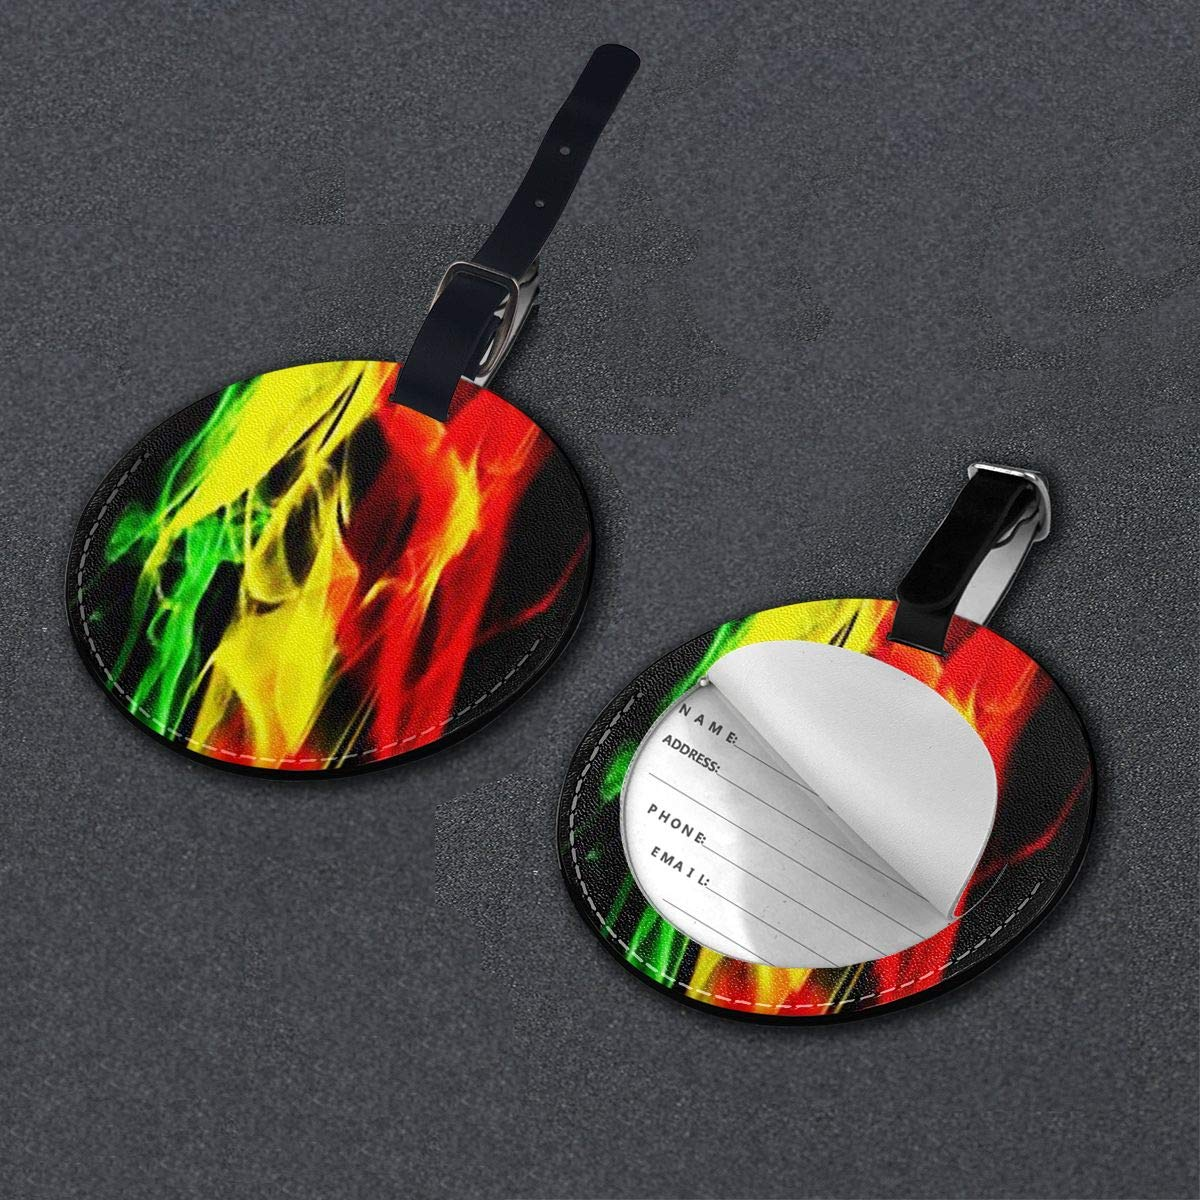 Free-2 Rasta Colored Smoke Luggage Tag 3D Print Leather Travel Bag ID Card